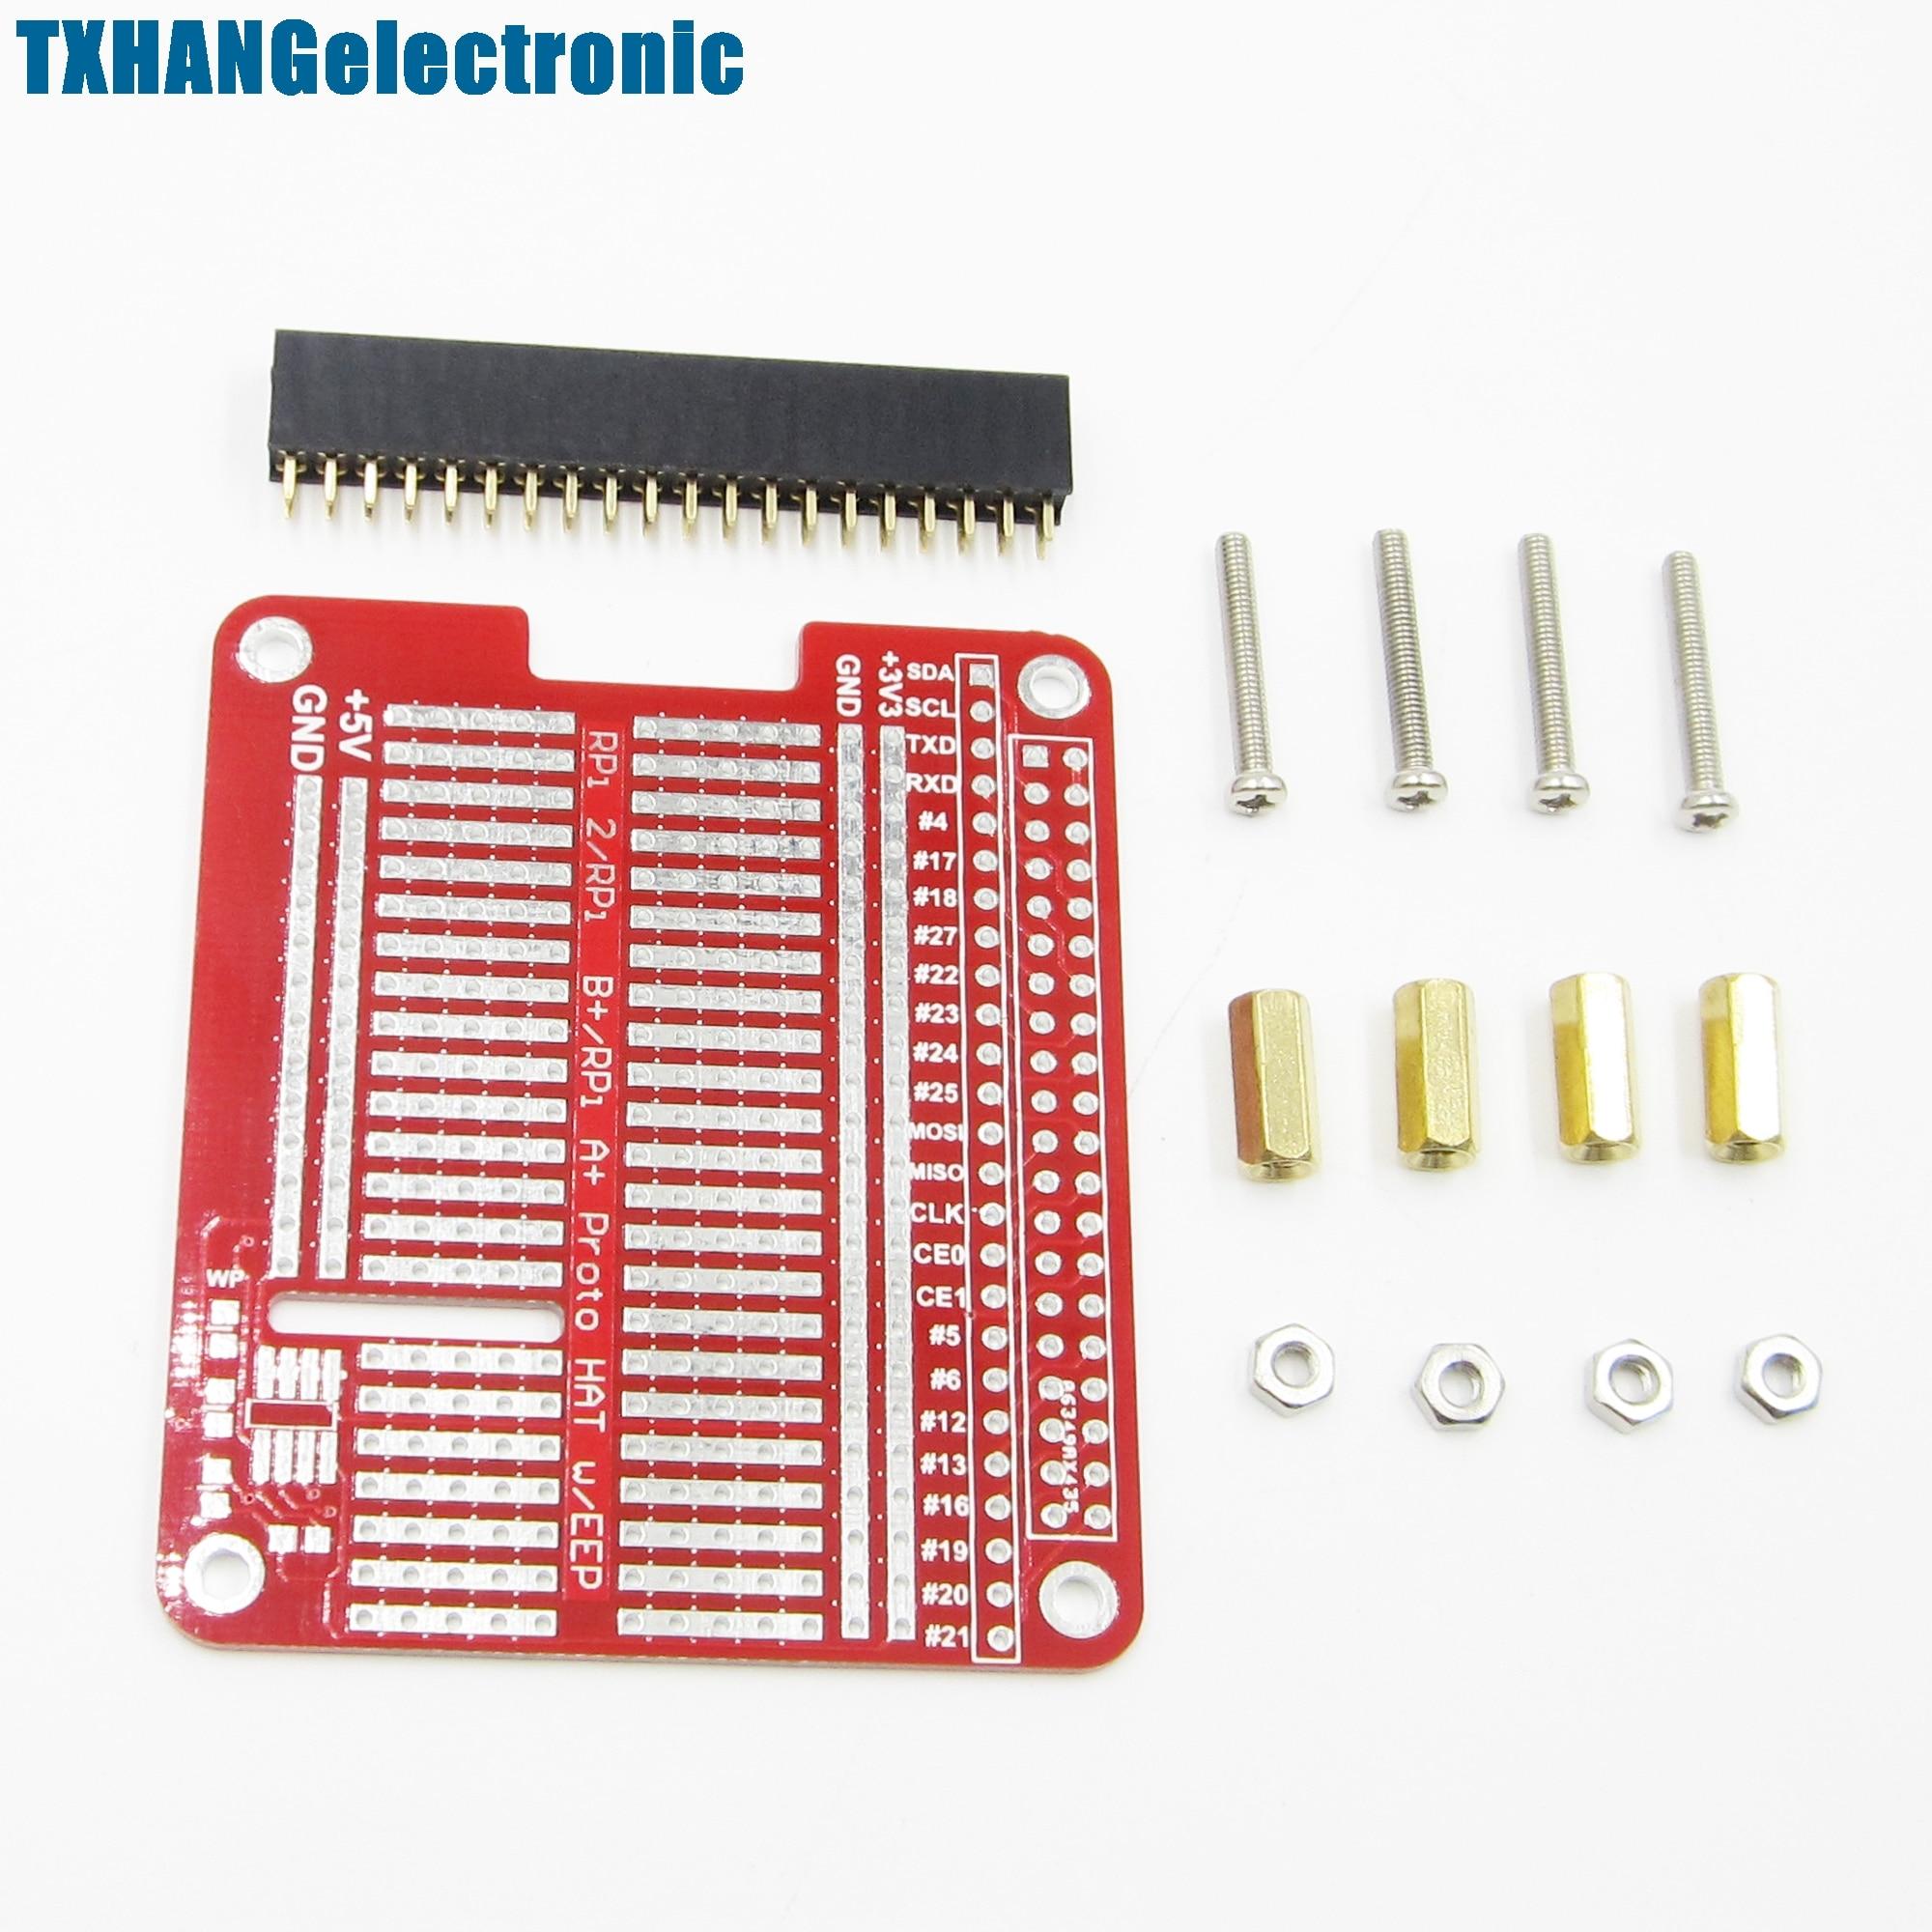 Prototyping Hat Shield Hole Plate DIY Kit For Raspberry Pi 2 Model B A+//B